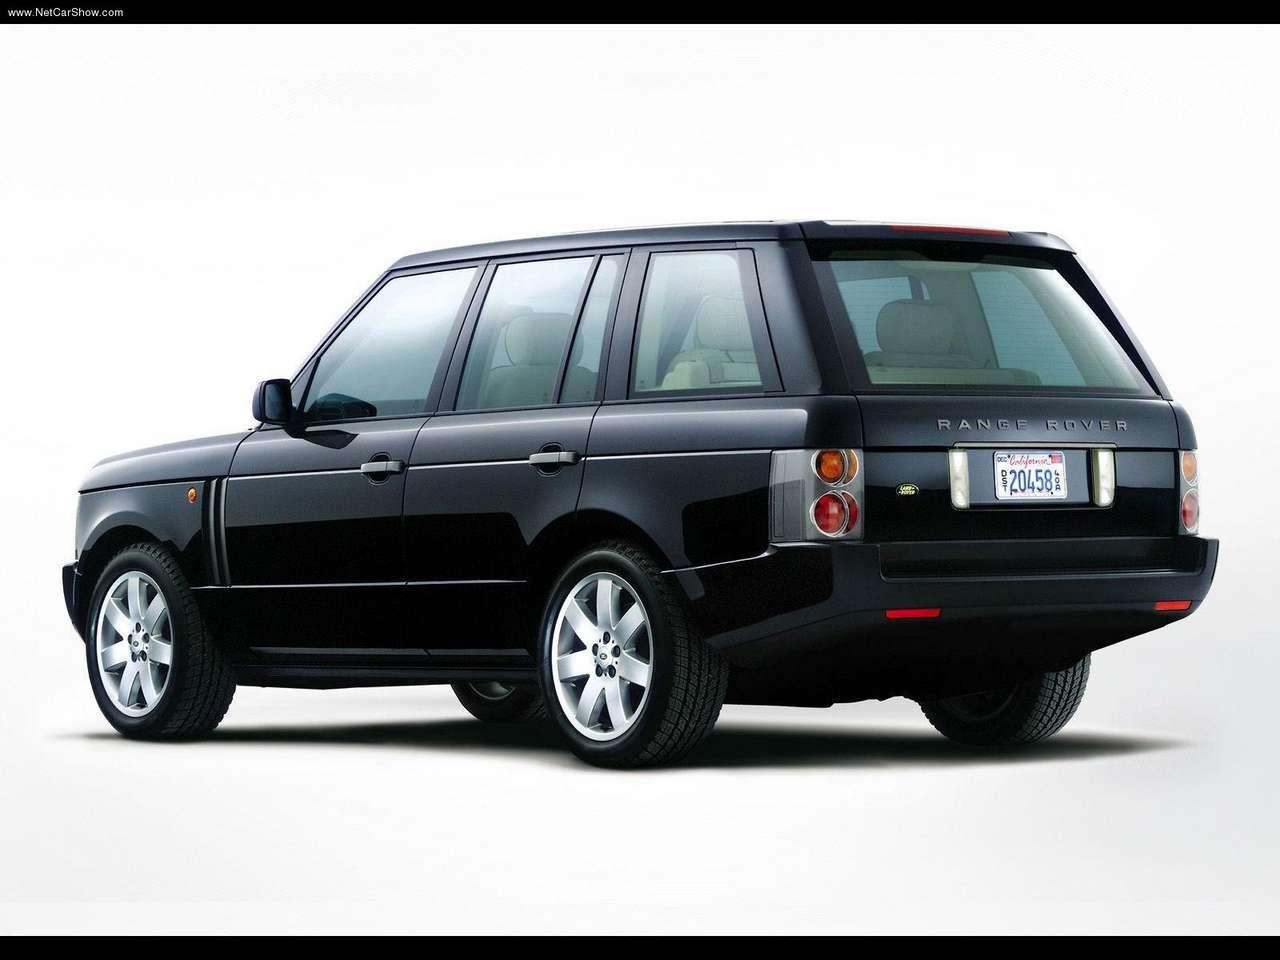 Range Rover, Land Rover, Land Rover Range Rover, L322, Range Rover L322, 4x4, classic Land Rover, retro land Rover, classic Range Rover, motoring, automotive, classic car, retro car, featured, not2grand, not2grand.co.uk